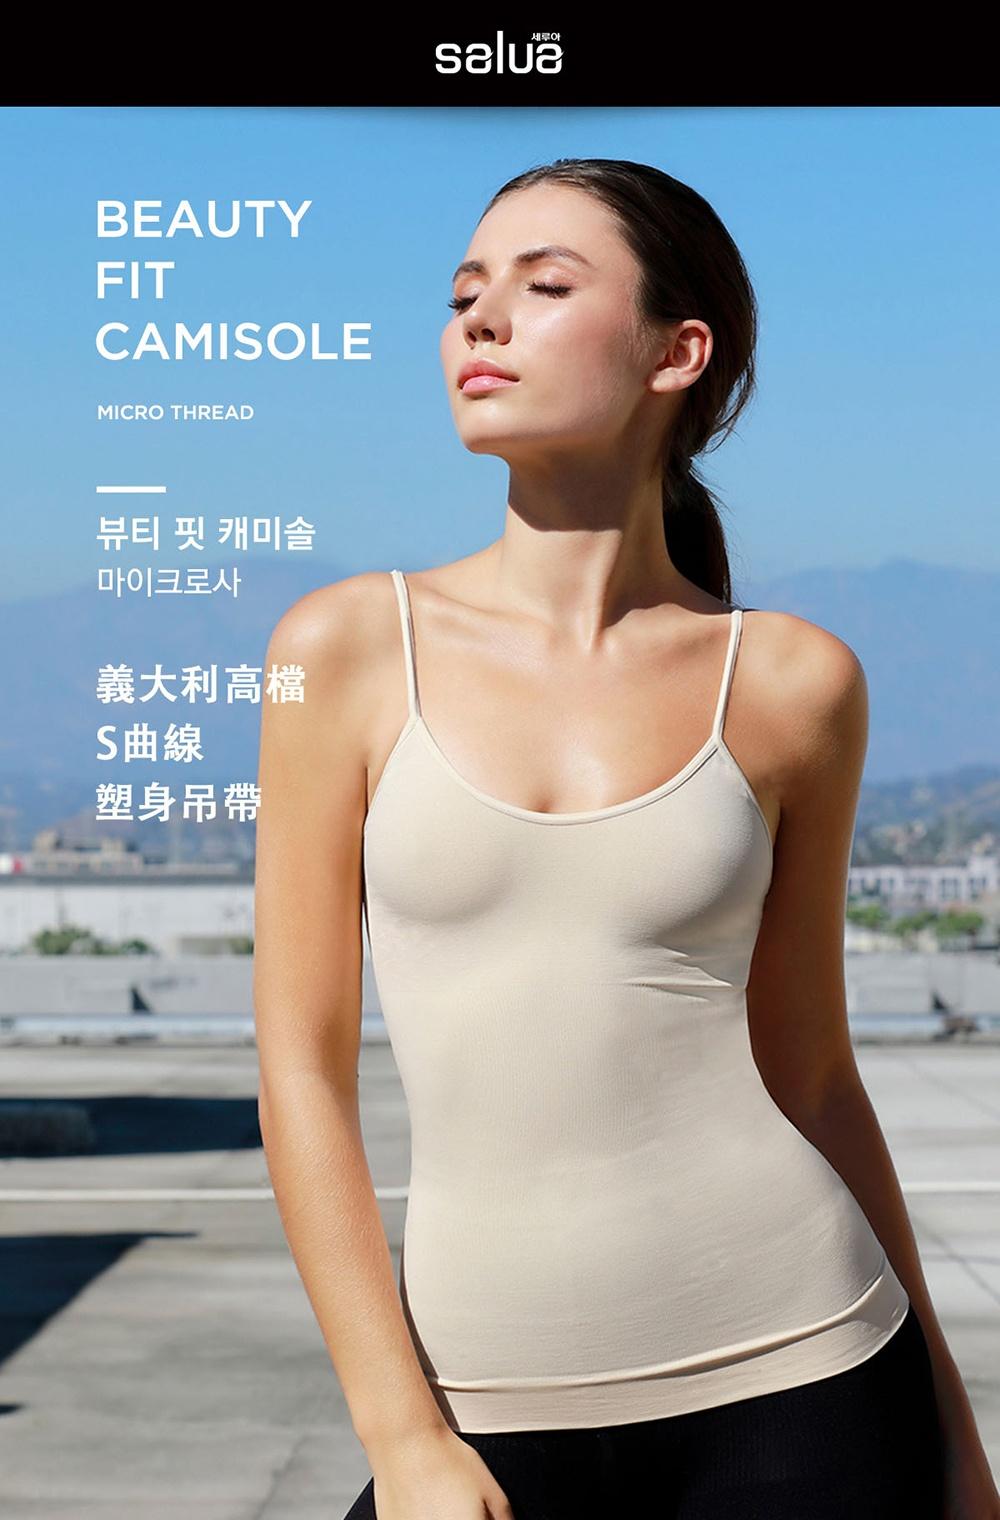 【salua韓國進口】義大利高檔S曲線塑身吊帶 - original_COVER_01